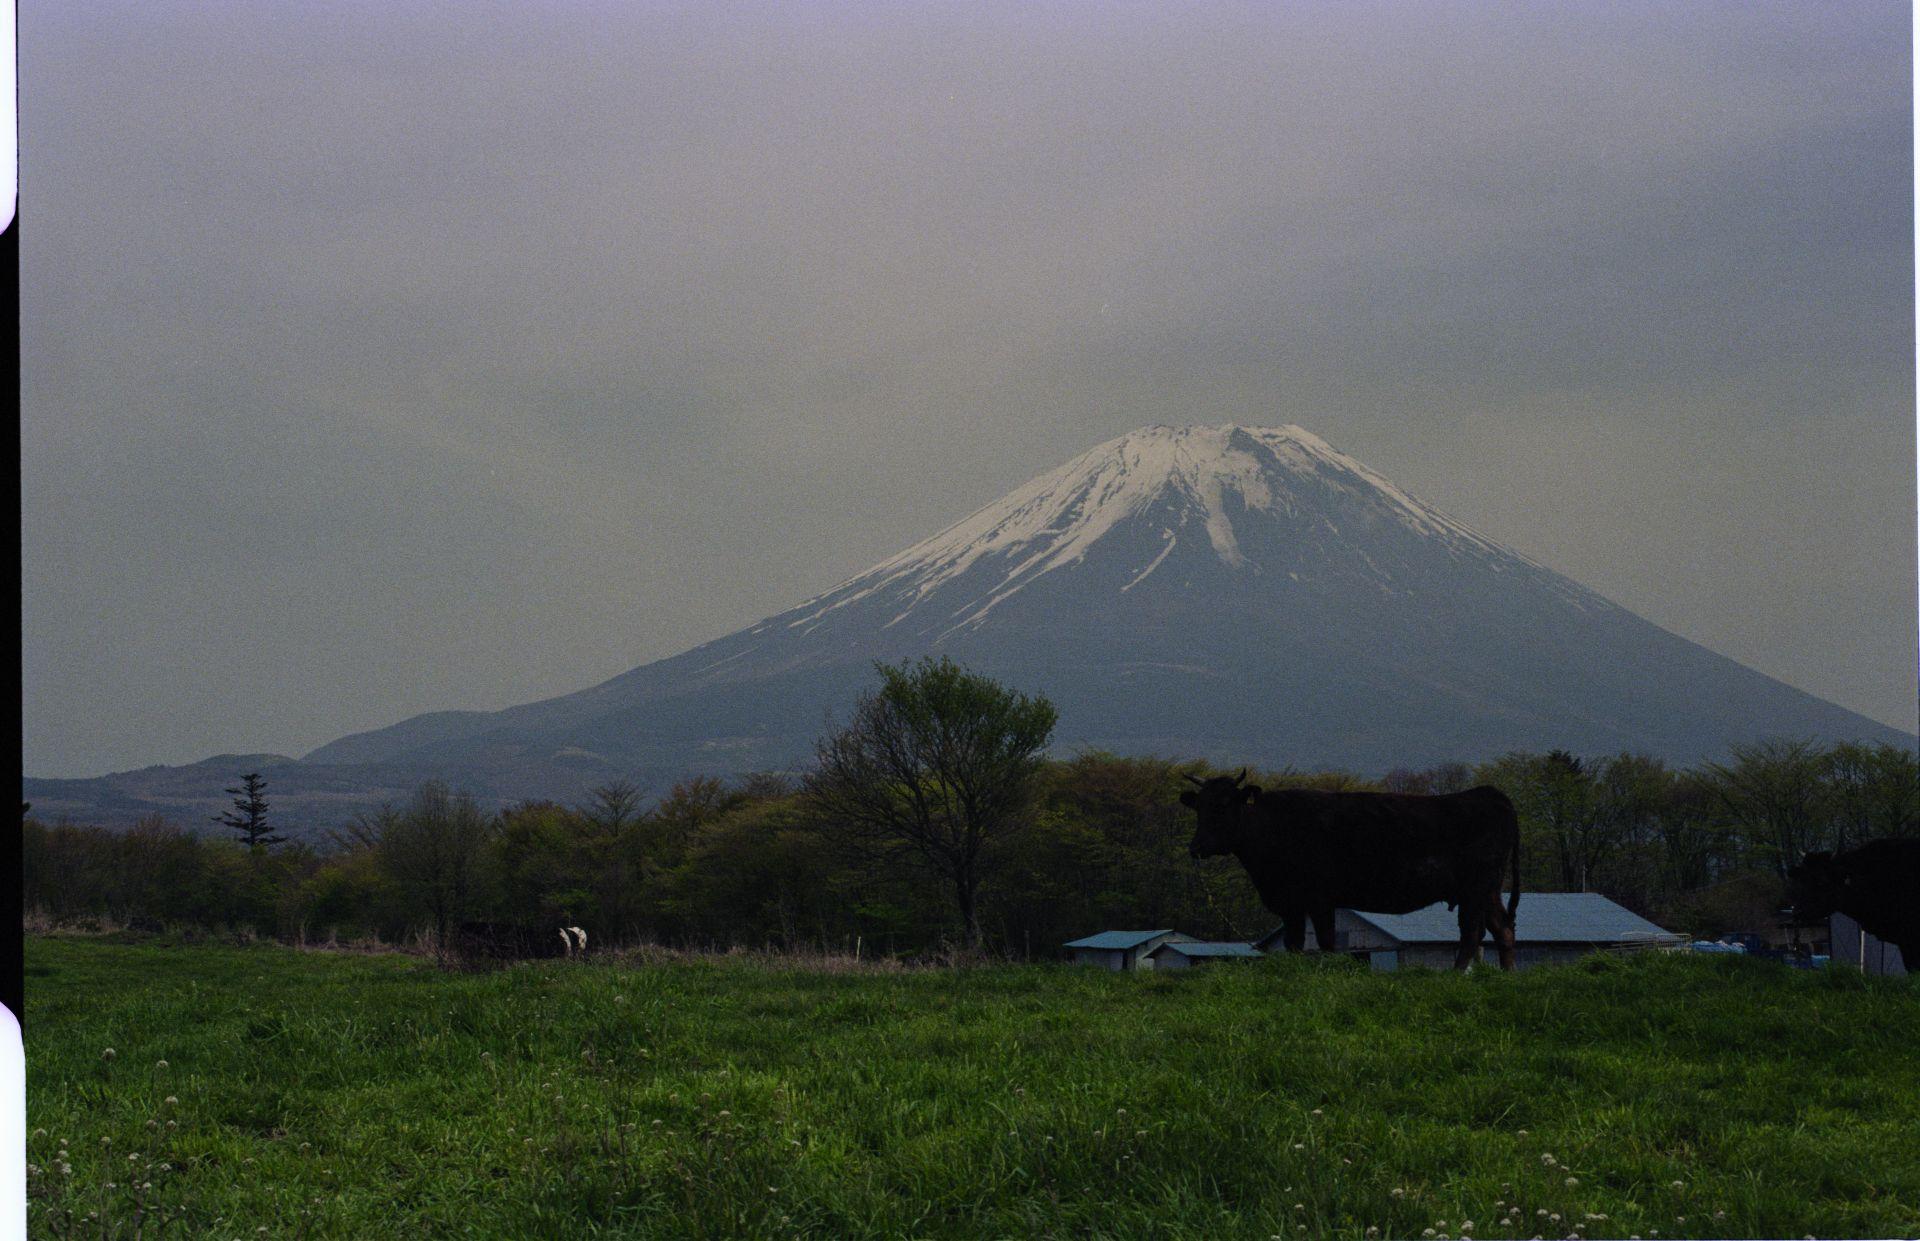 f:id:yasuo_ssi:20201015235243j:plain